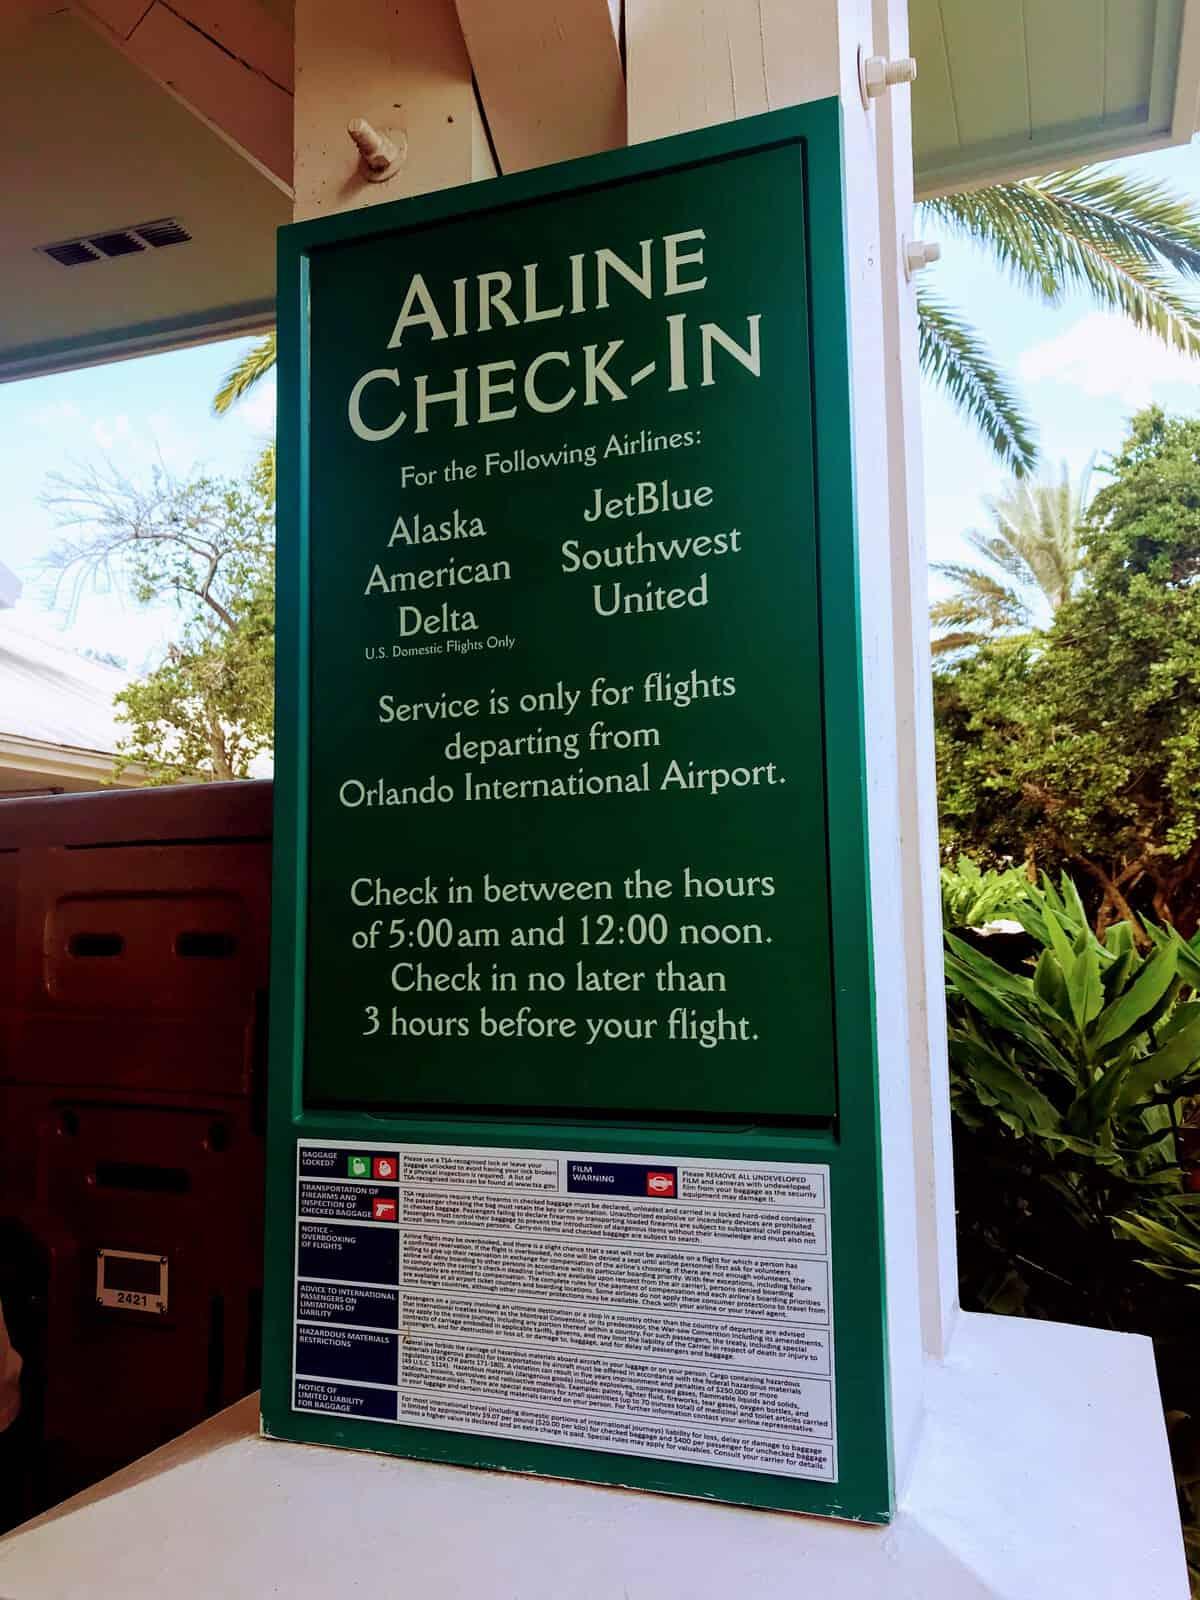 Resort Airline Checkin